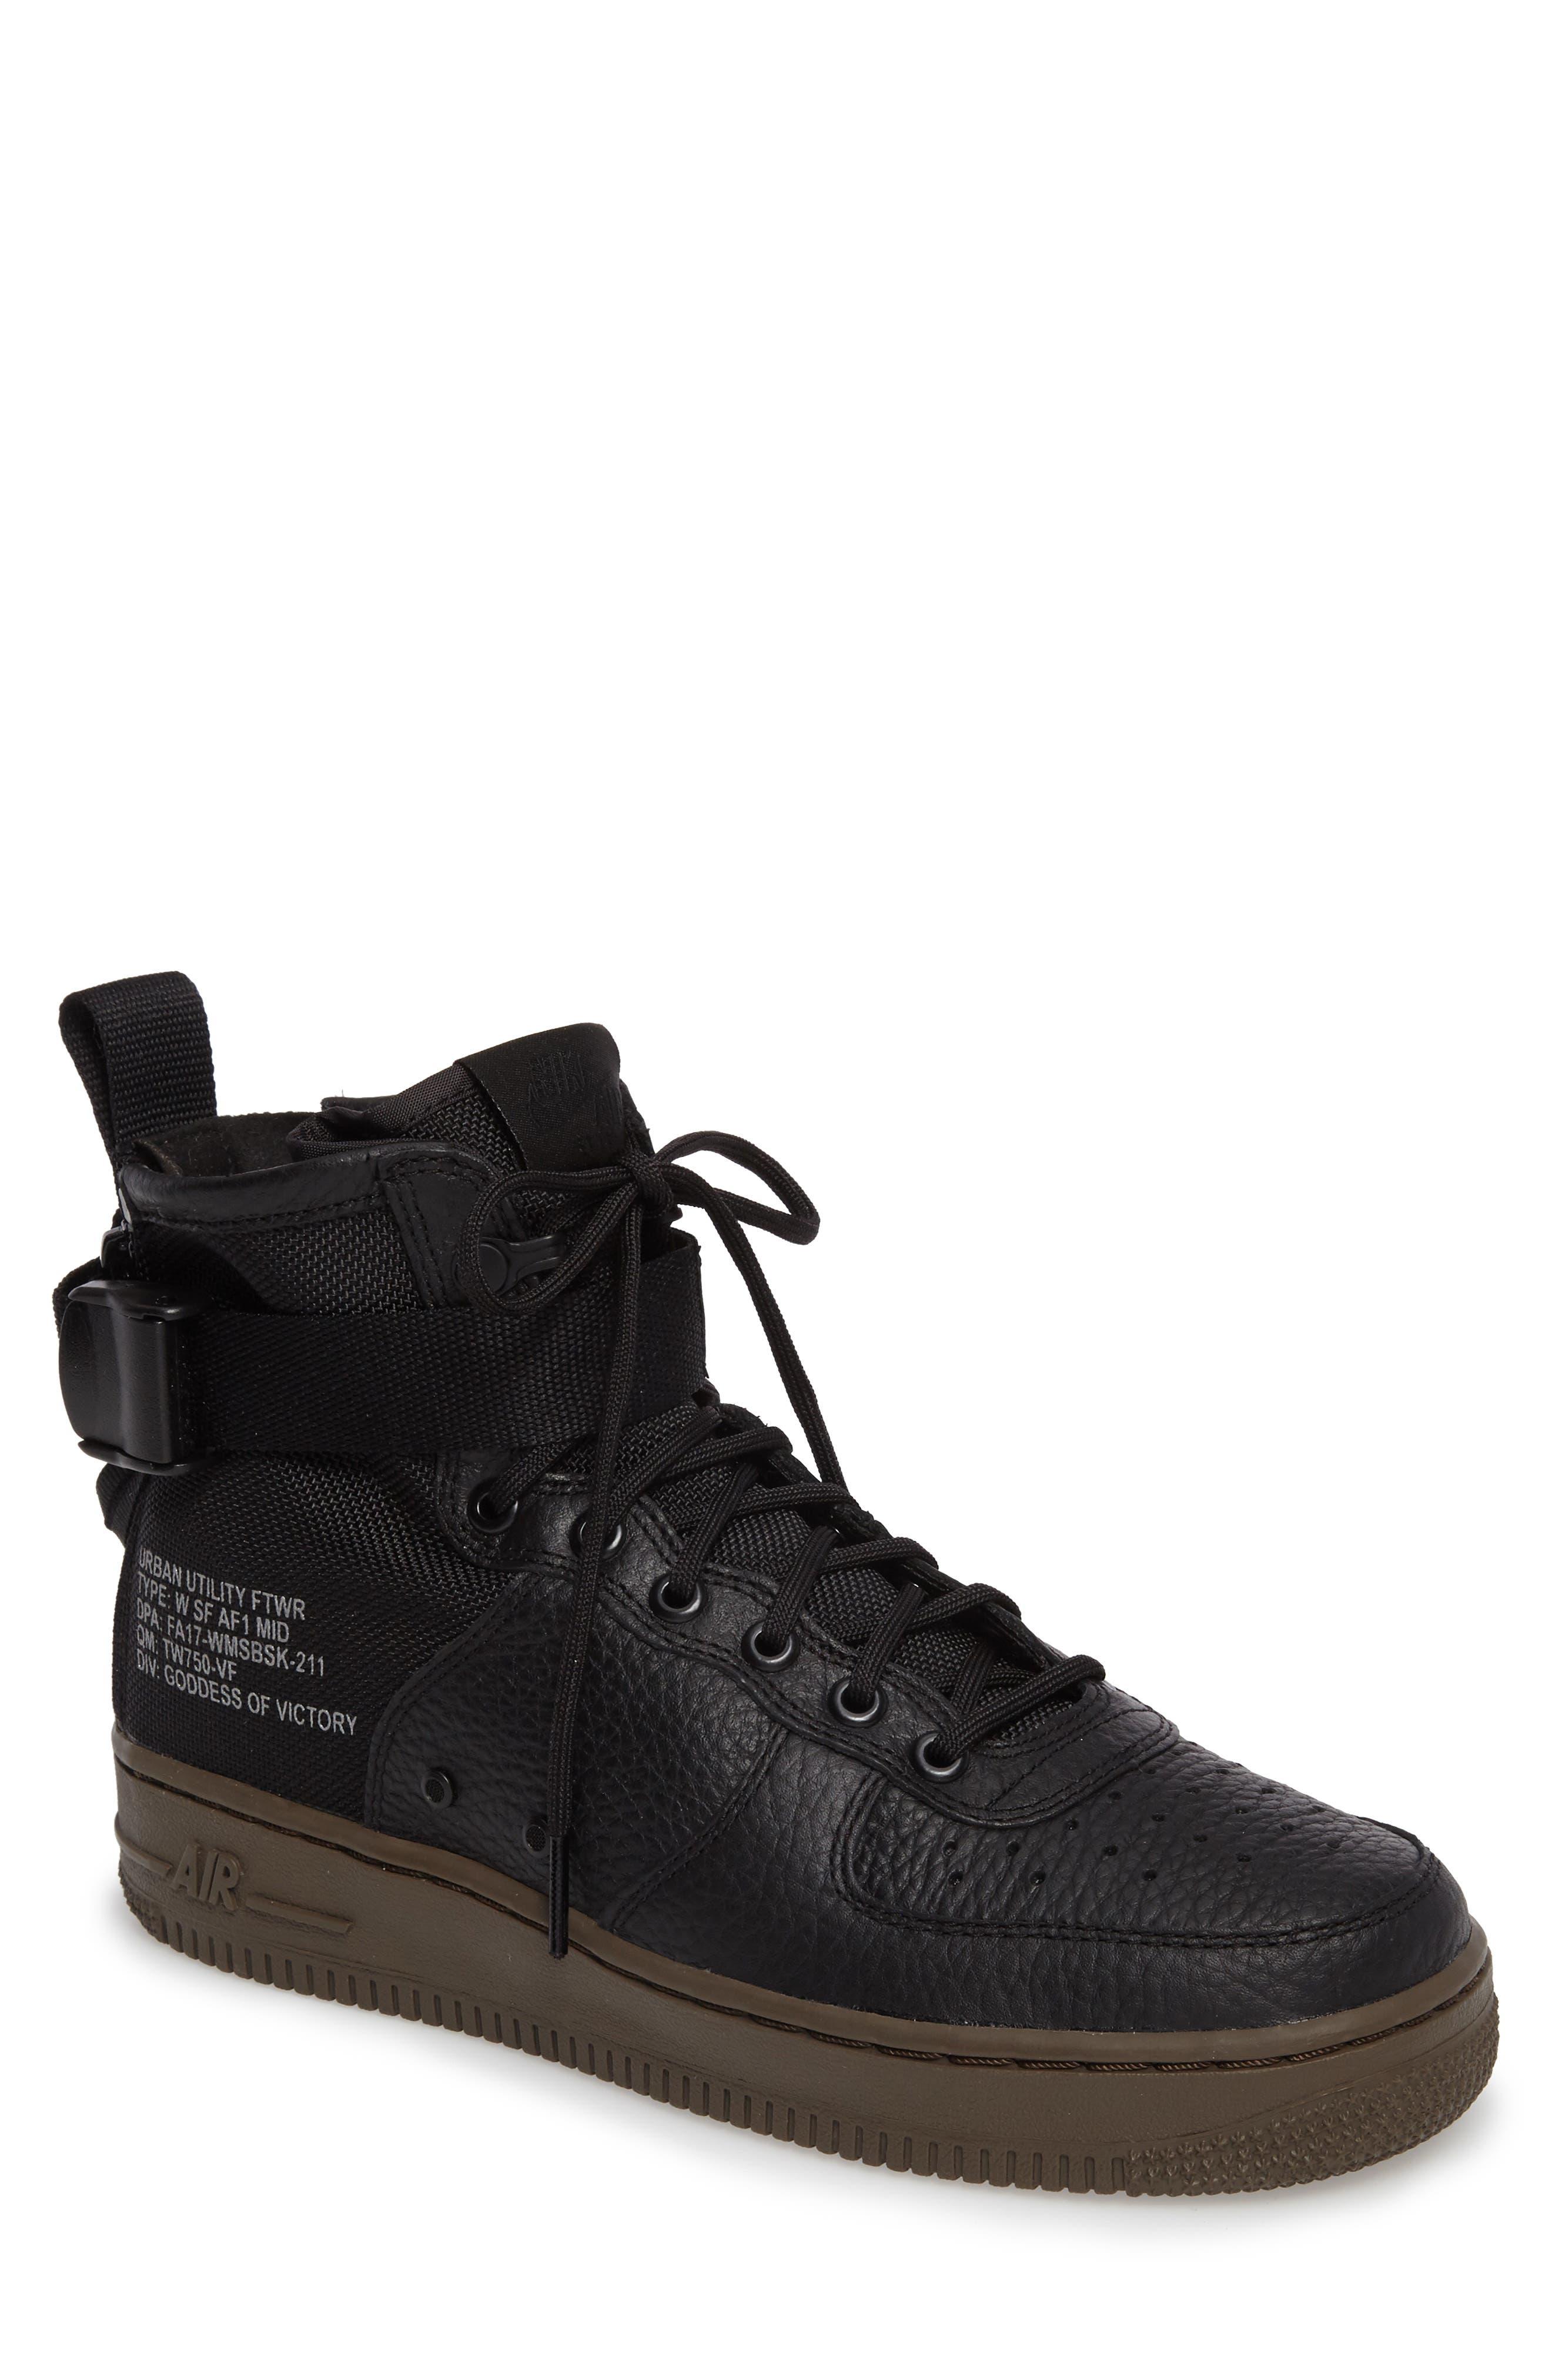 SF Air Force 1 Mid Sneaker,                             Main thumbnail 1, color,                             003